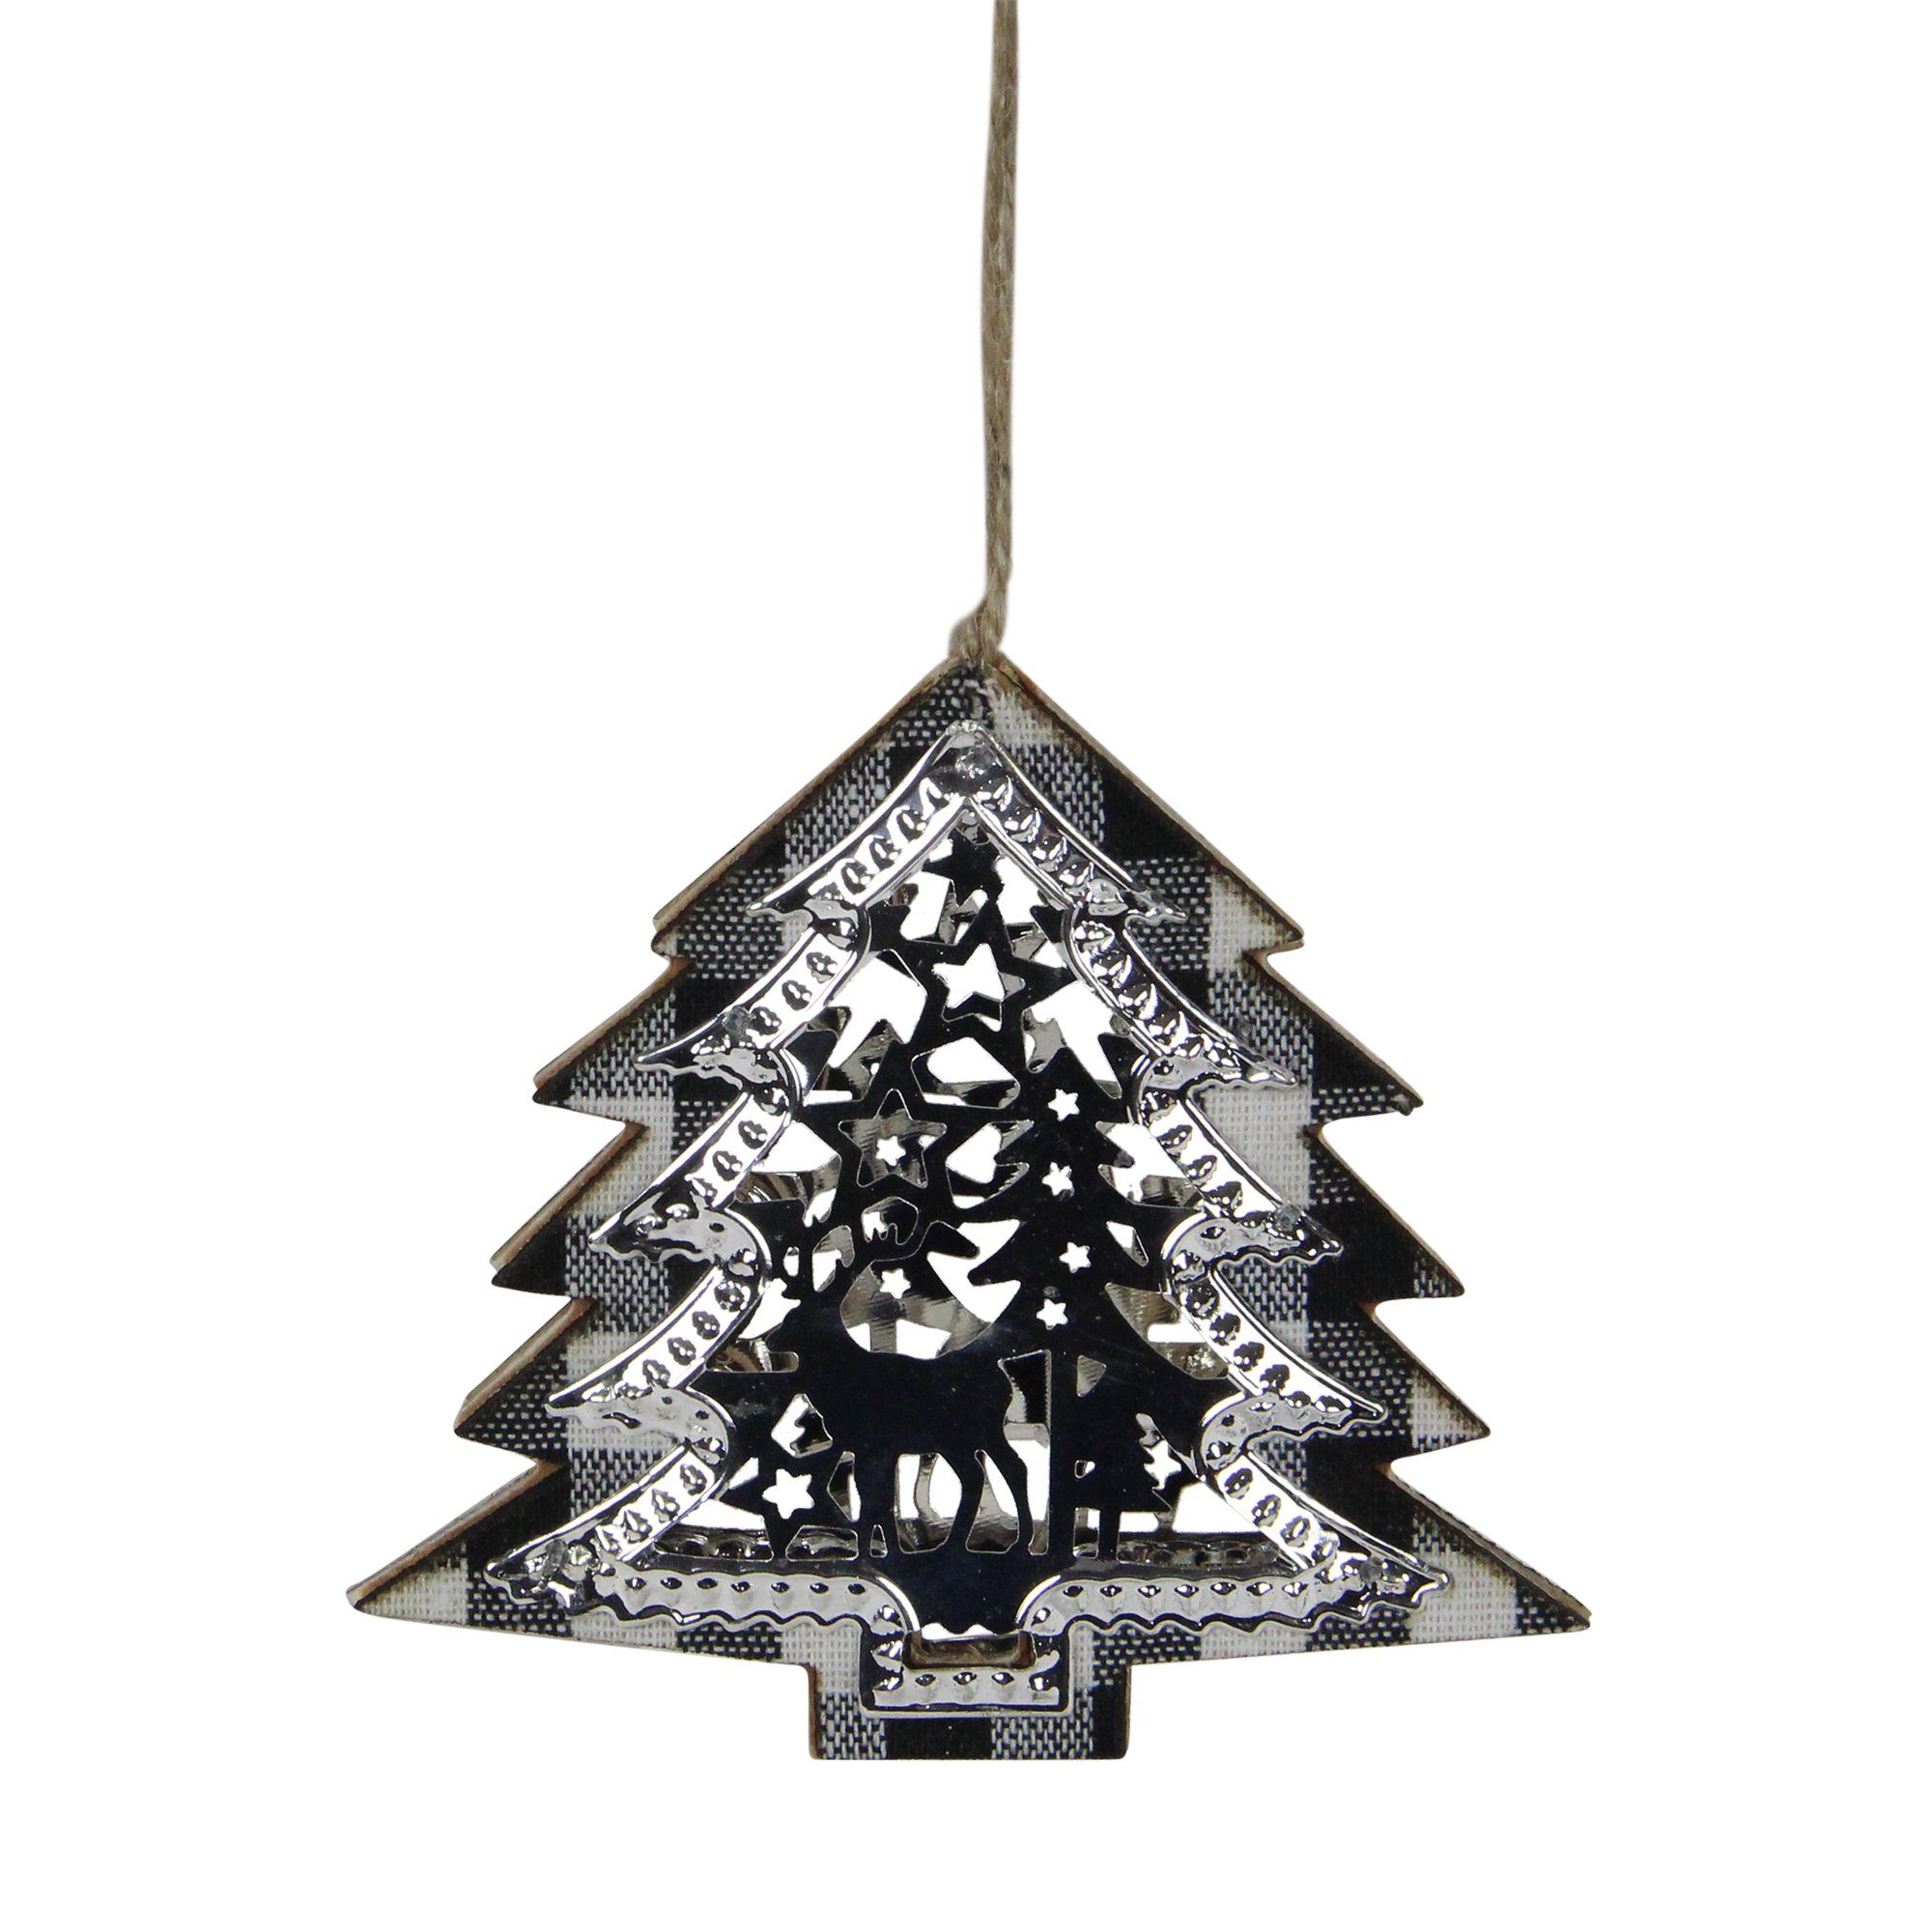 4 25 Black And White Buffalo Plaid Christmas Tree Shaped Reindeer Ornament Walmart Com Walmart Com